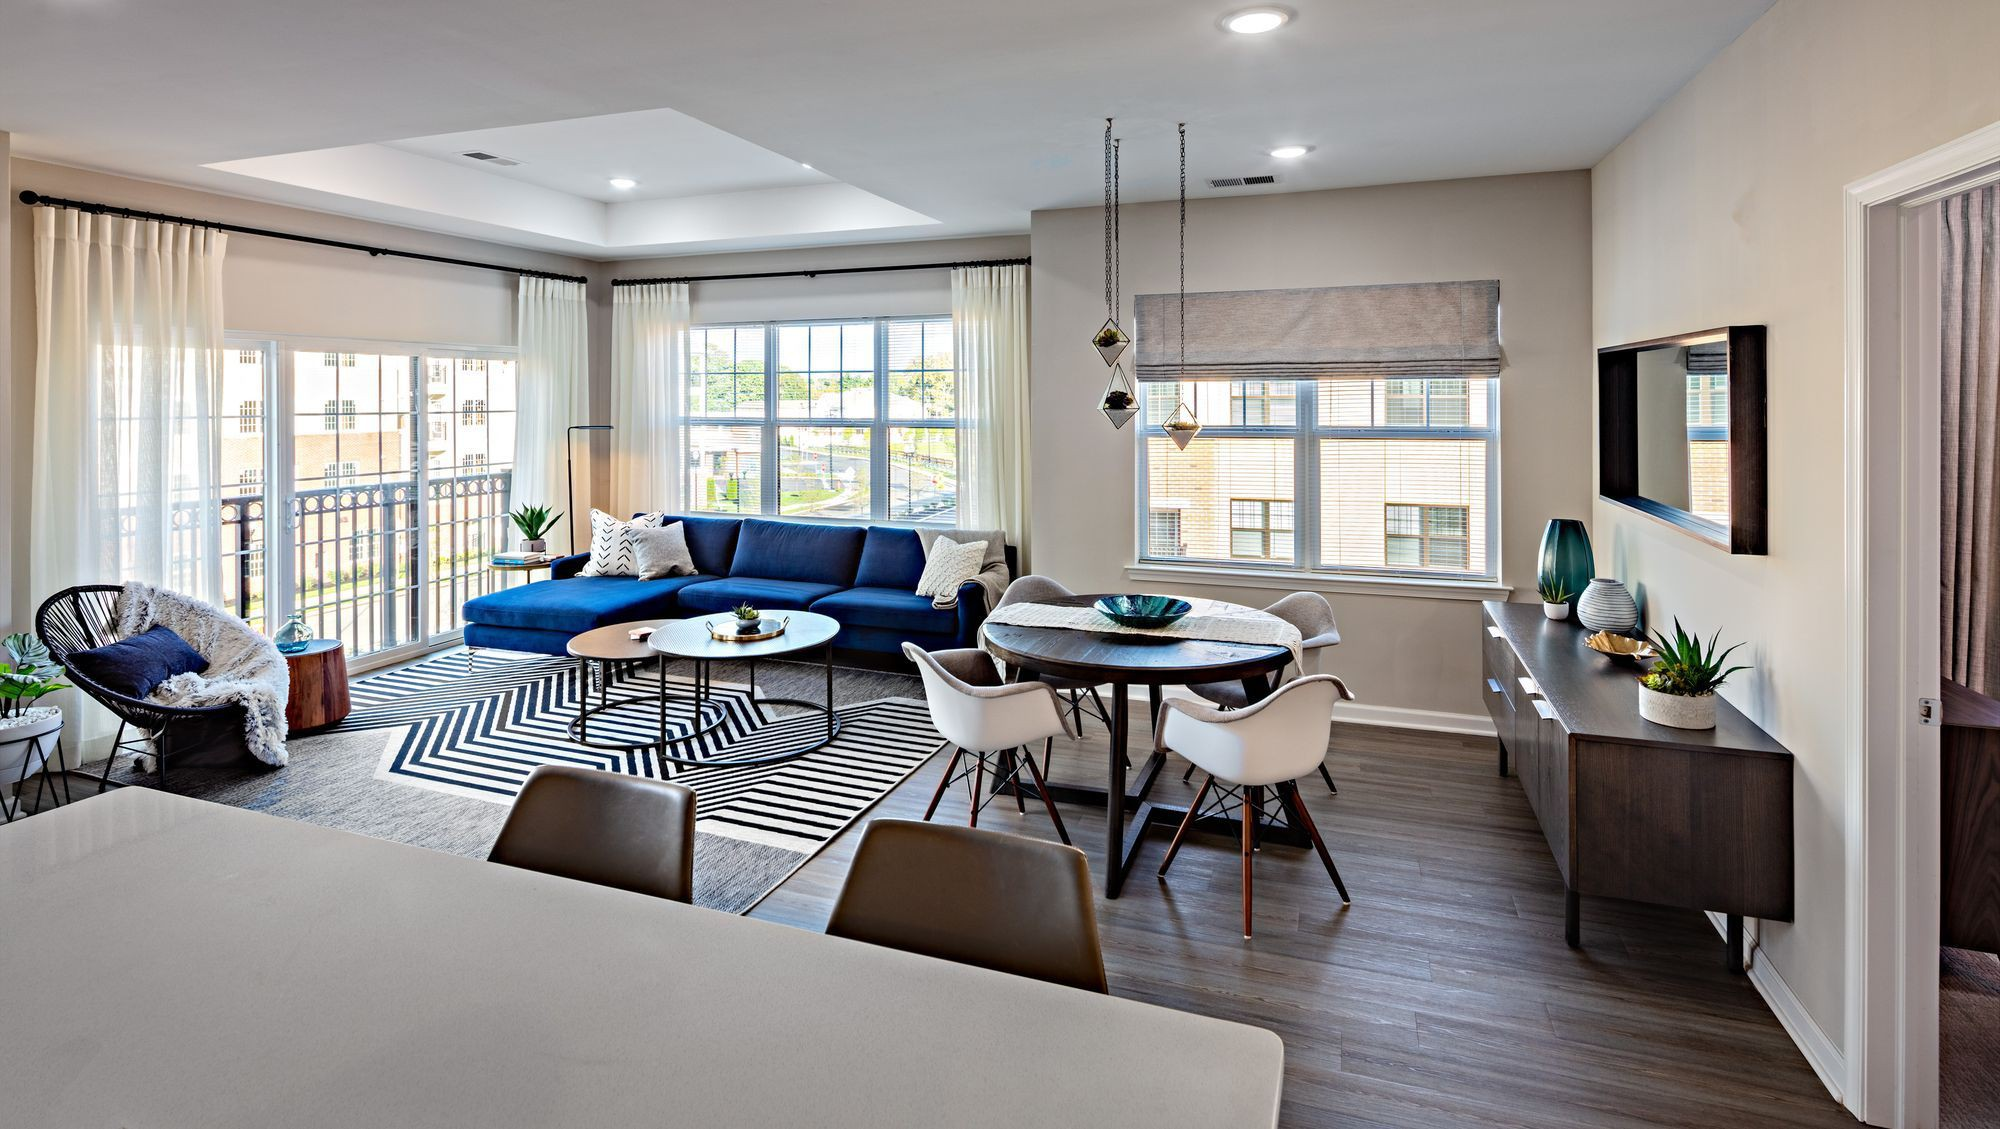 Apartments Near Rutgers The Edge at Raritan Heights for Rutgers University Students in New Brunswick, NJ